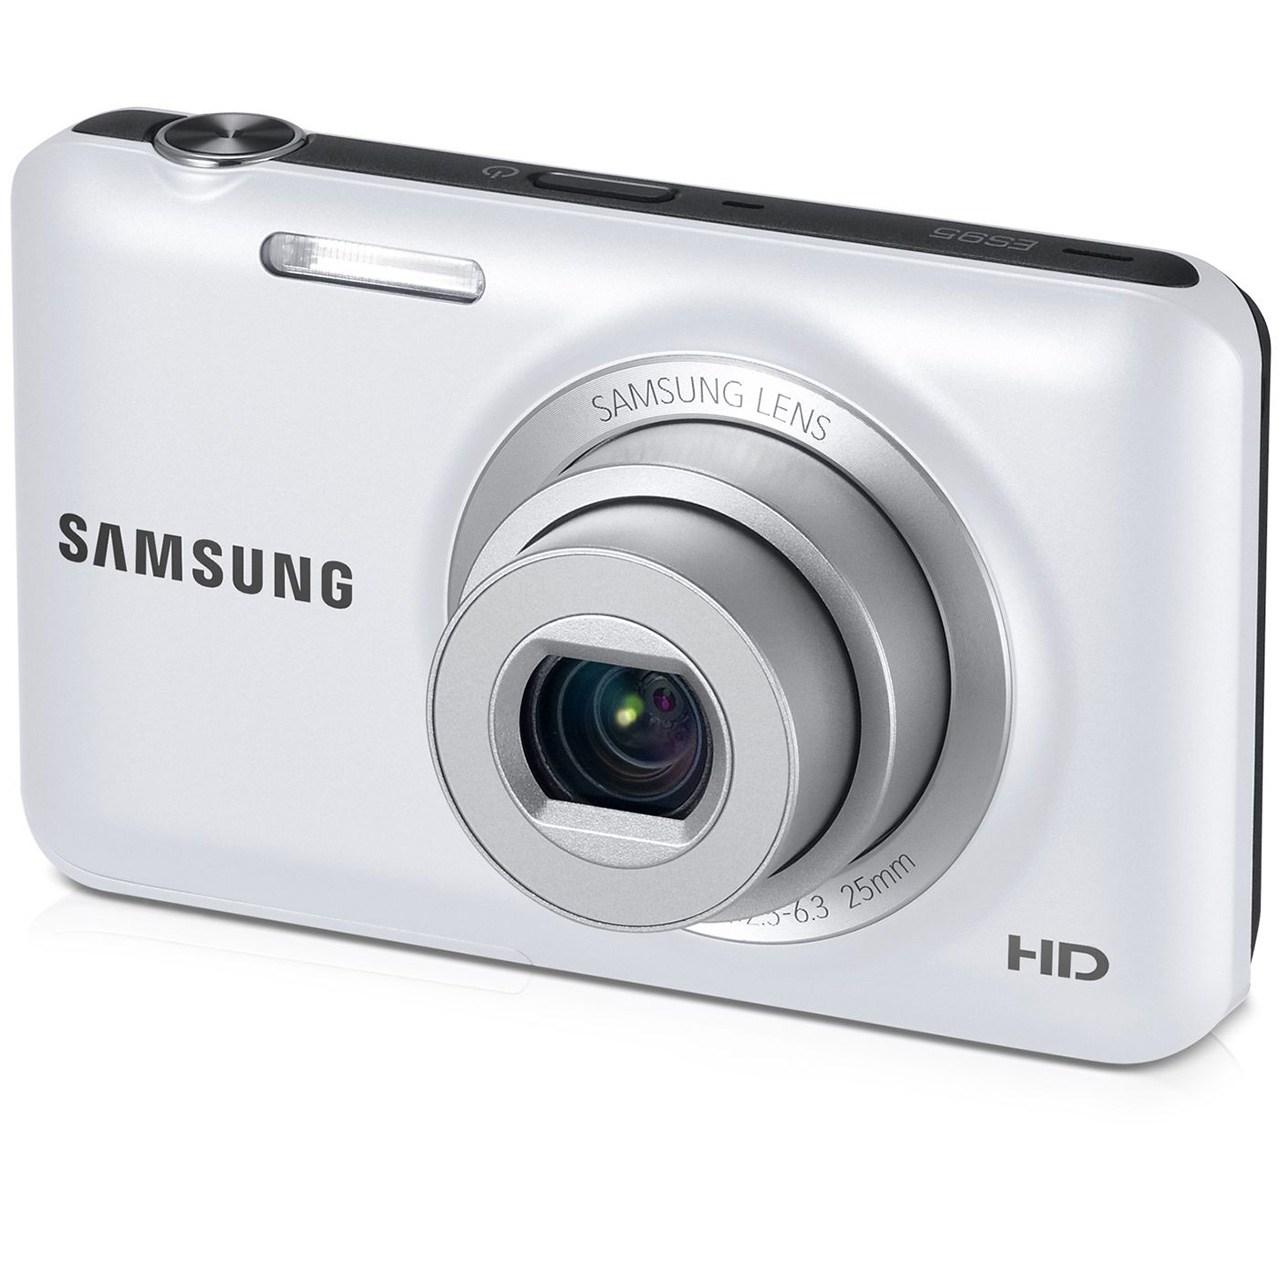 دوربين ديجيتال سامسونگ مدل Samsung ST150F Digital Camera